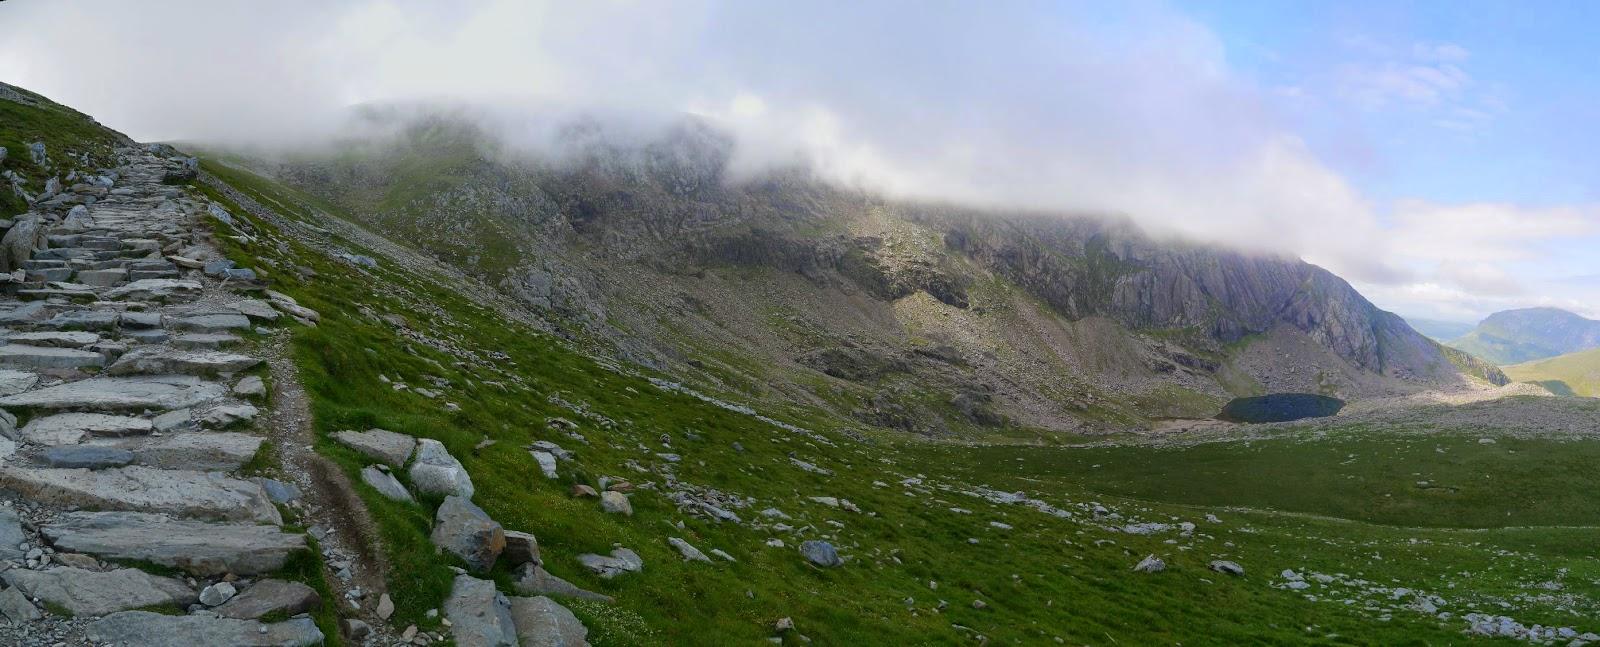 Taipei Hiker: 2014年6月18日 イギリス・スノードン山を登る Hiking up to Snowdon of Wales UK